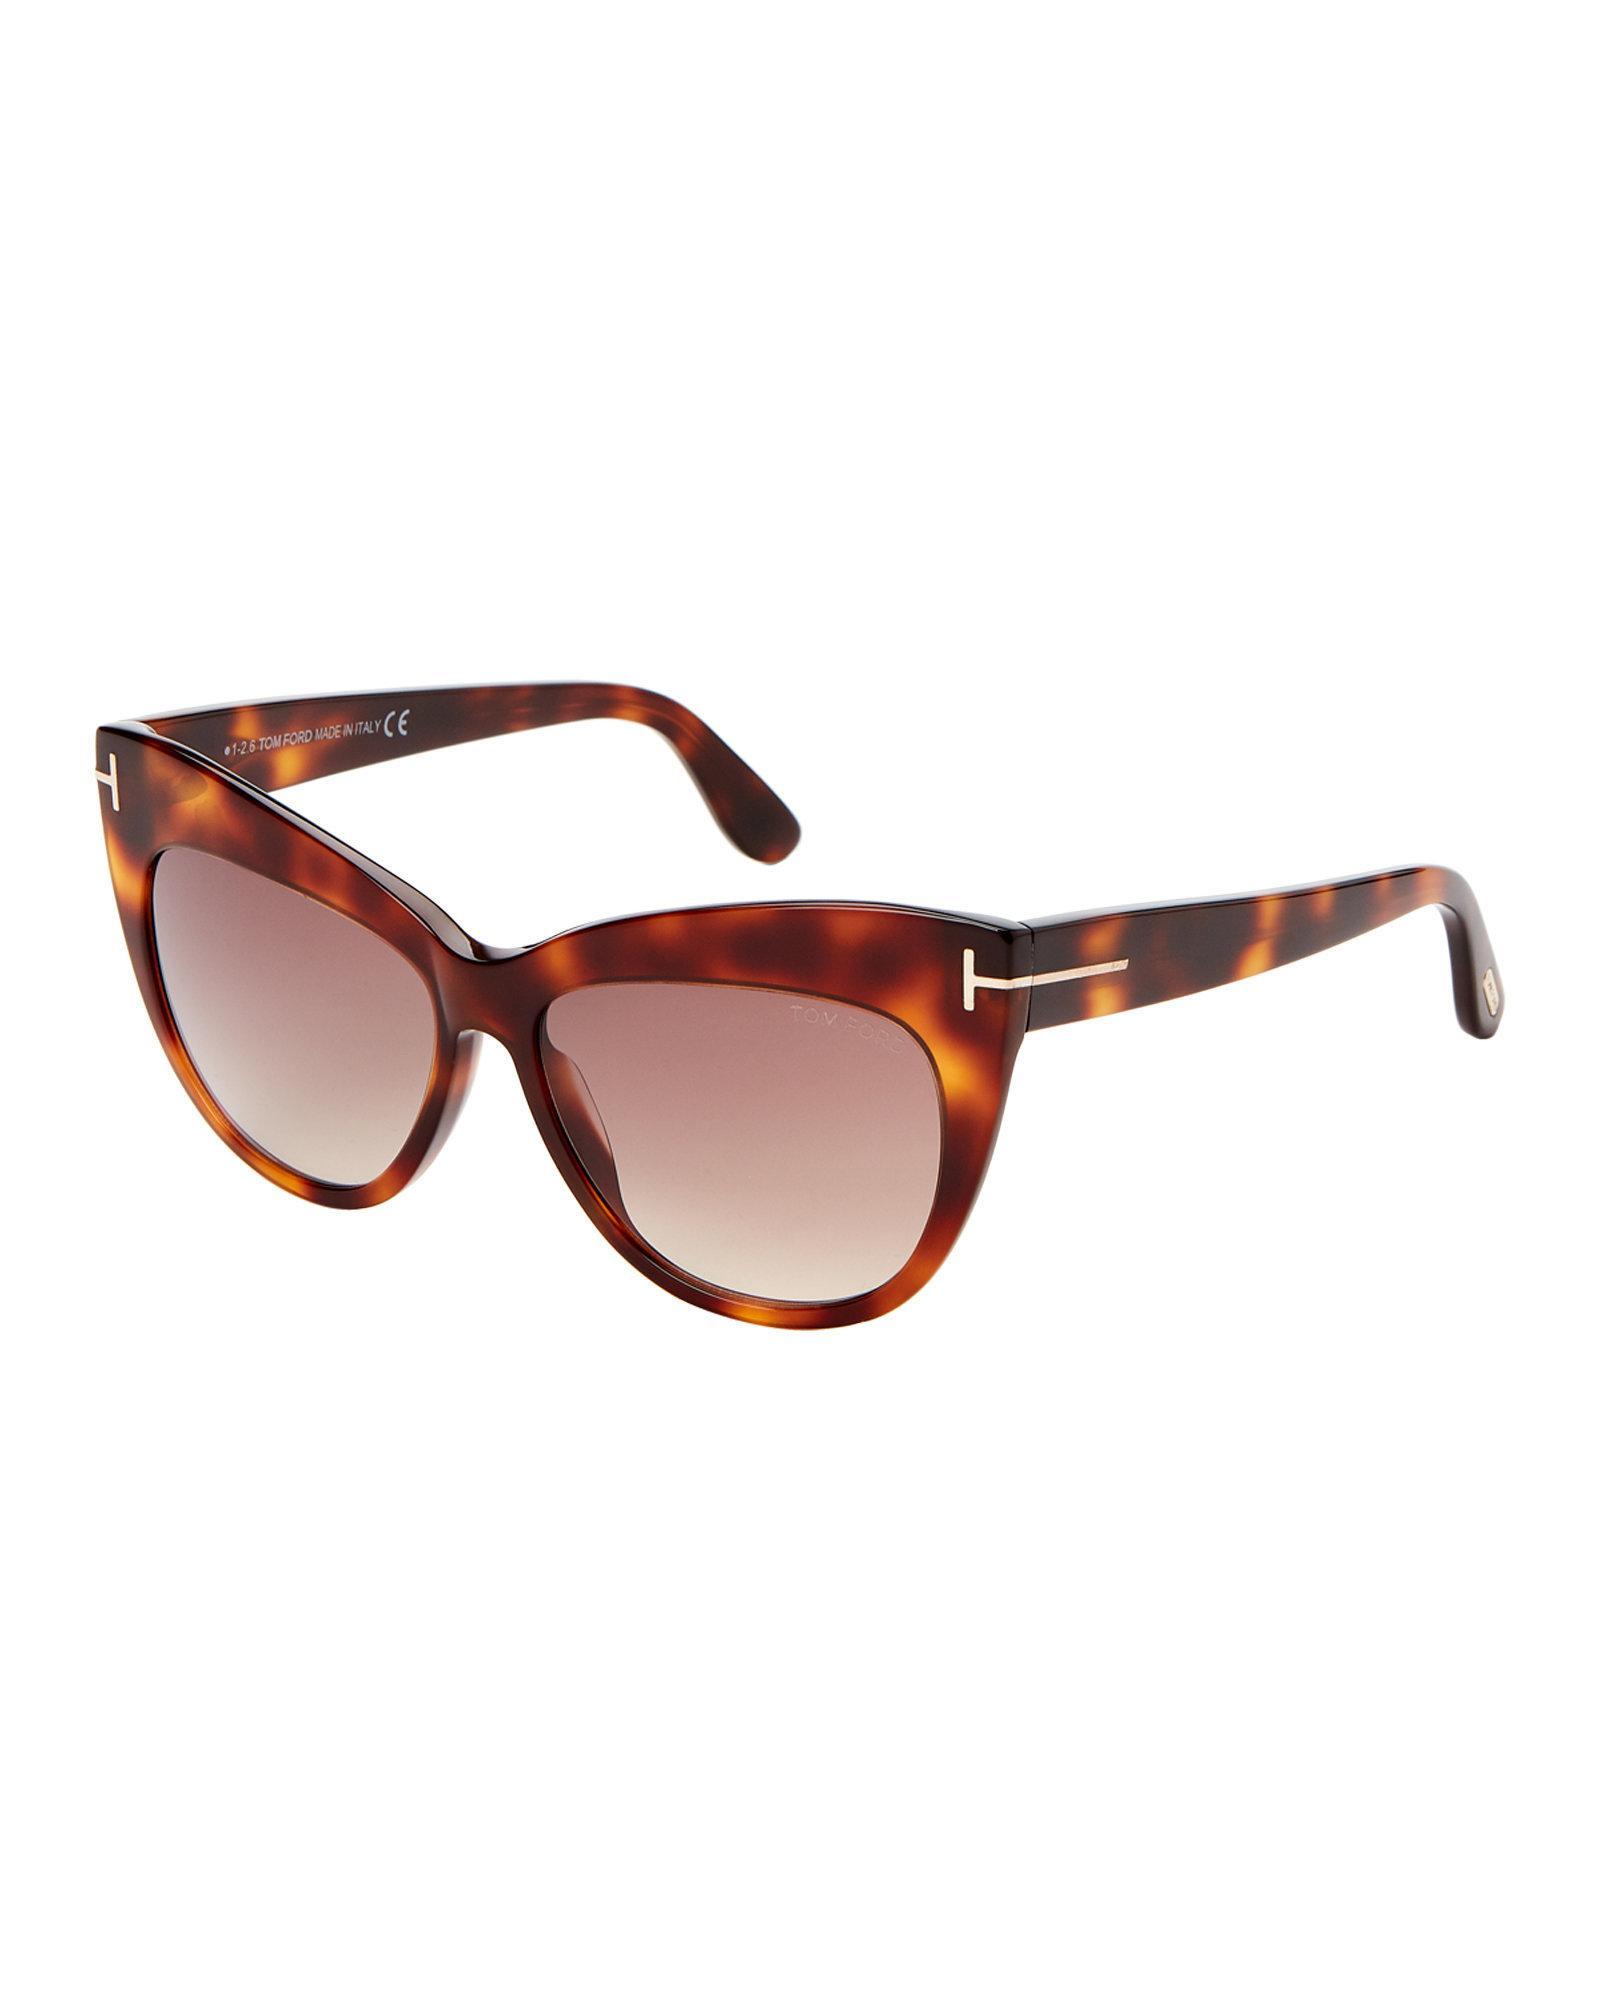 66b41d1c11b Lyst - Tom Ford Tf523 Tortoiseshell-look Nika Cat Eye Sunglasses in ...